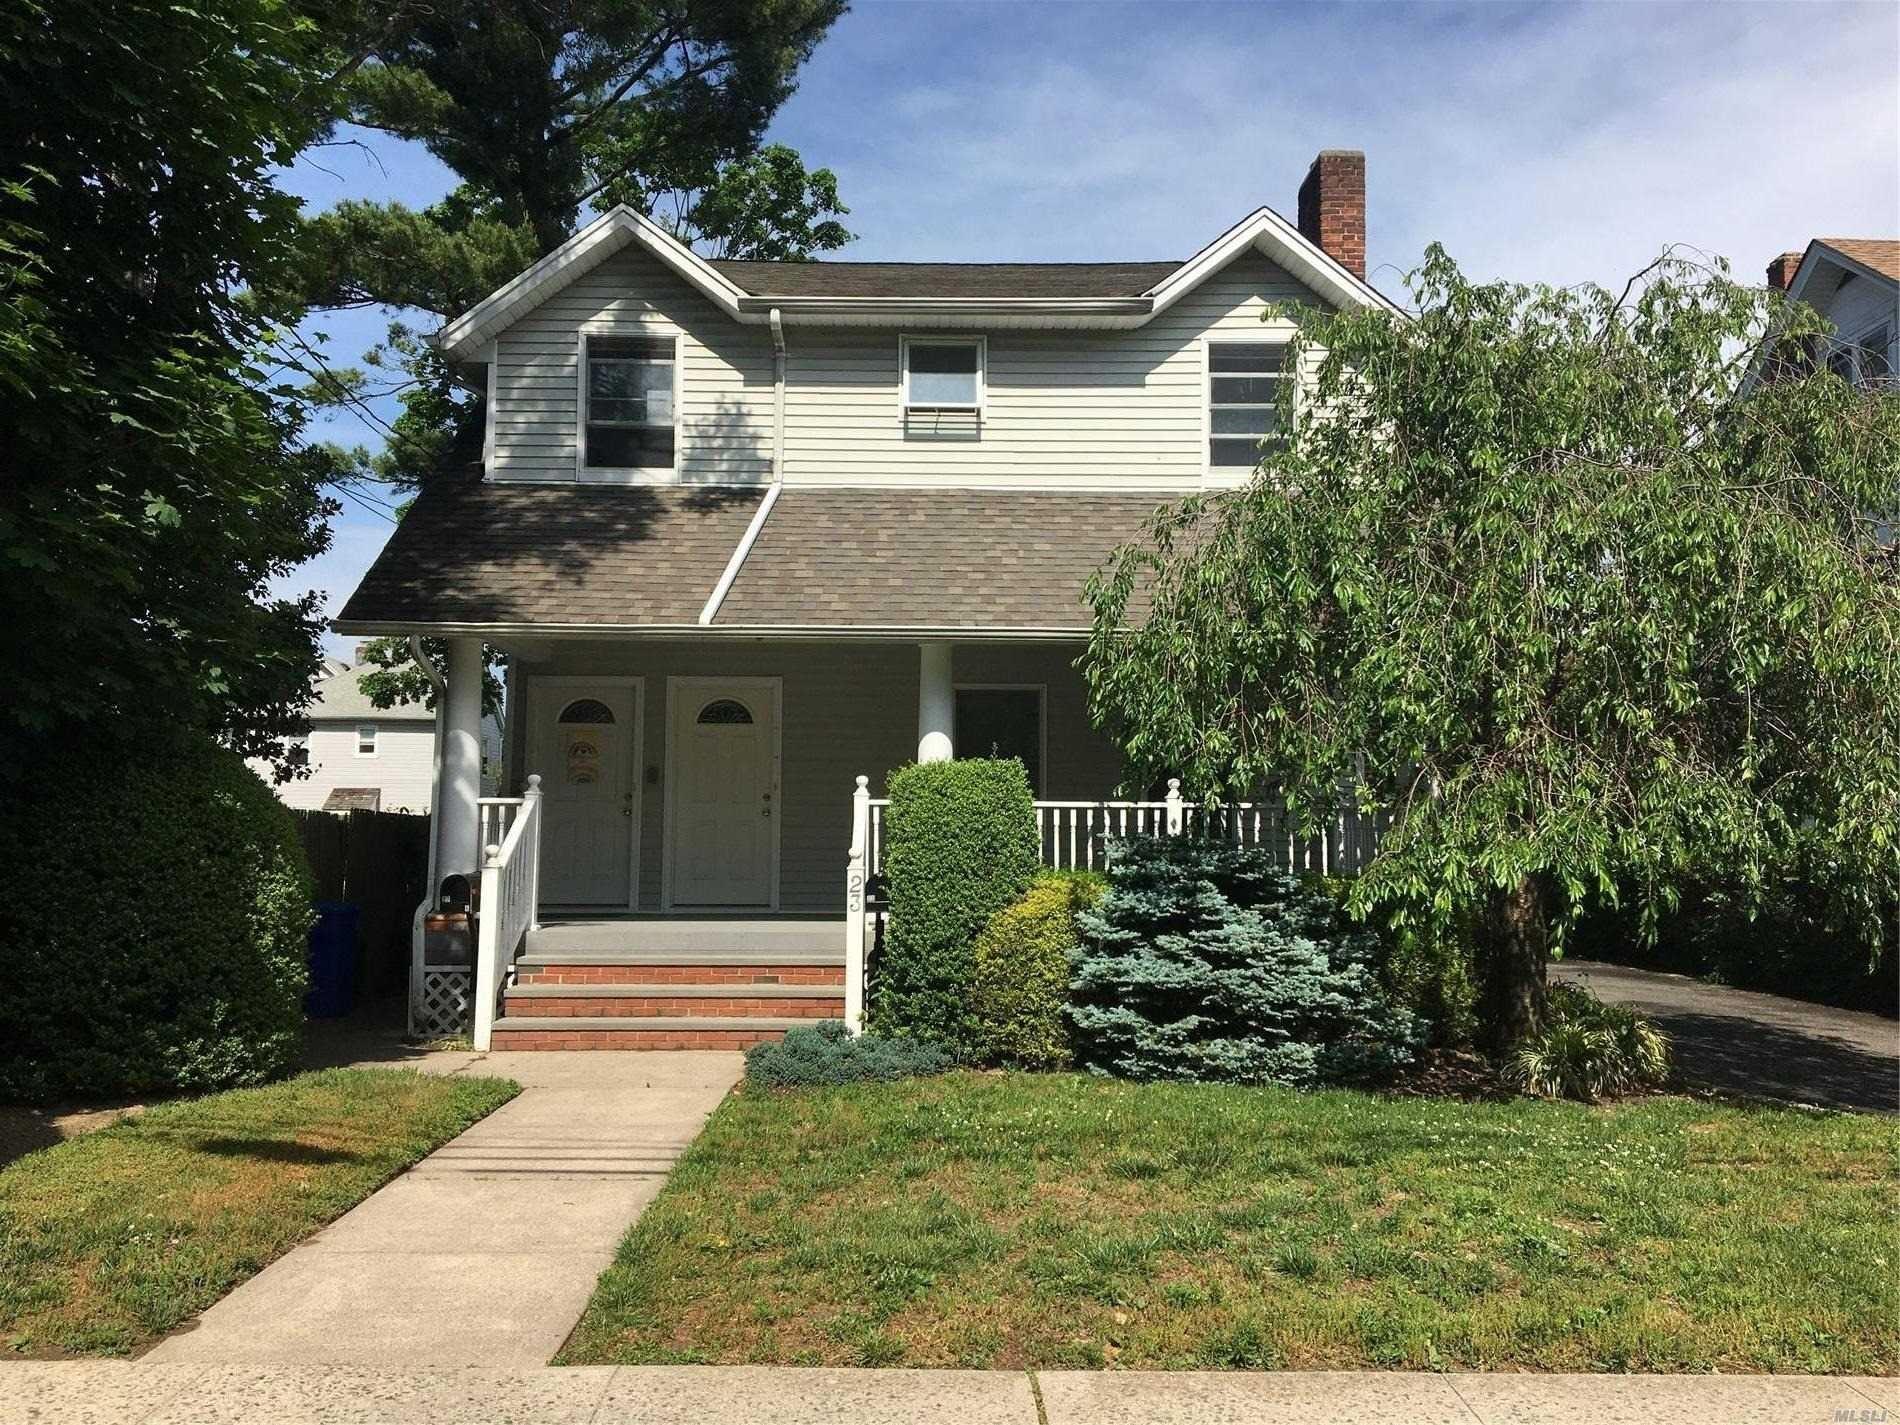 23 N Bayles Avenue #1st, Port Washington, NY 11050 - MLS#: 3220471